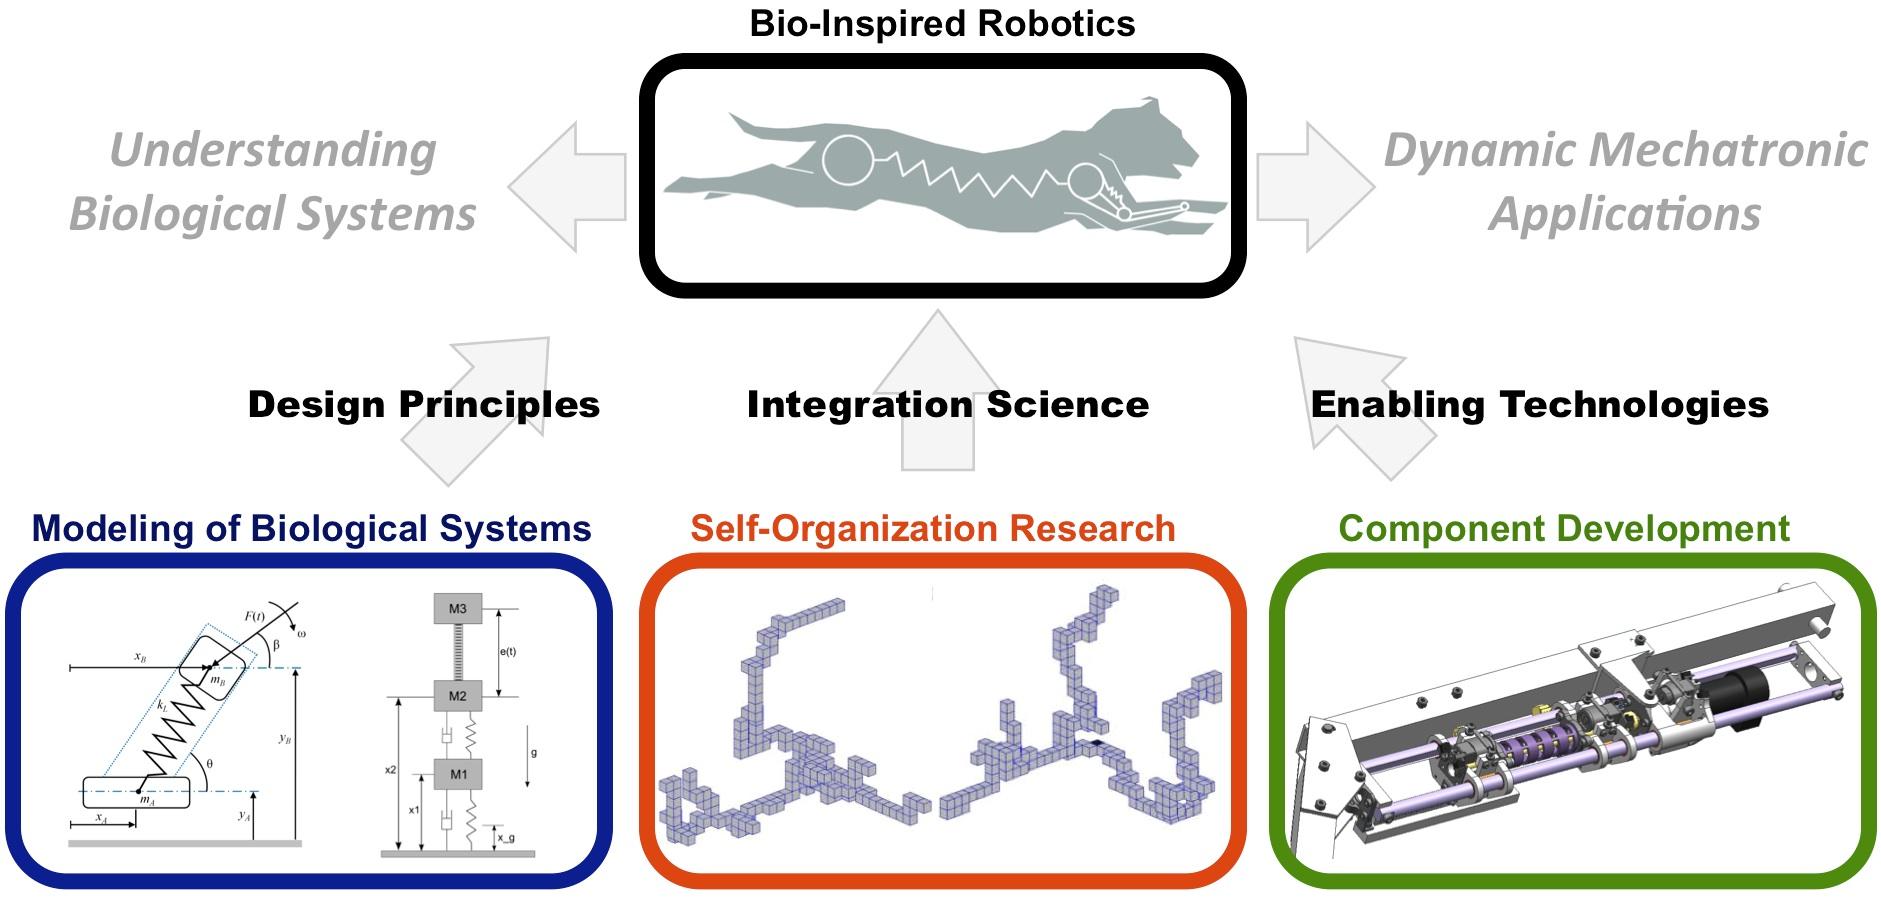 Researches intelligent robotics amp mechatronic system laboratory - Researches Intelligent Robotics Amp Mechatronic System Laboratory 16